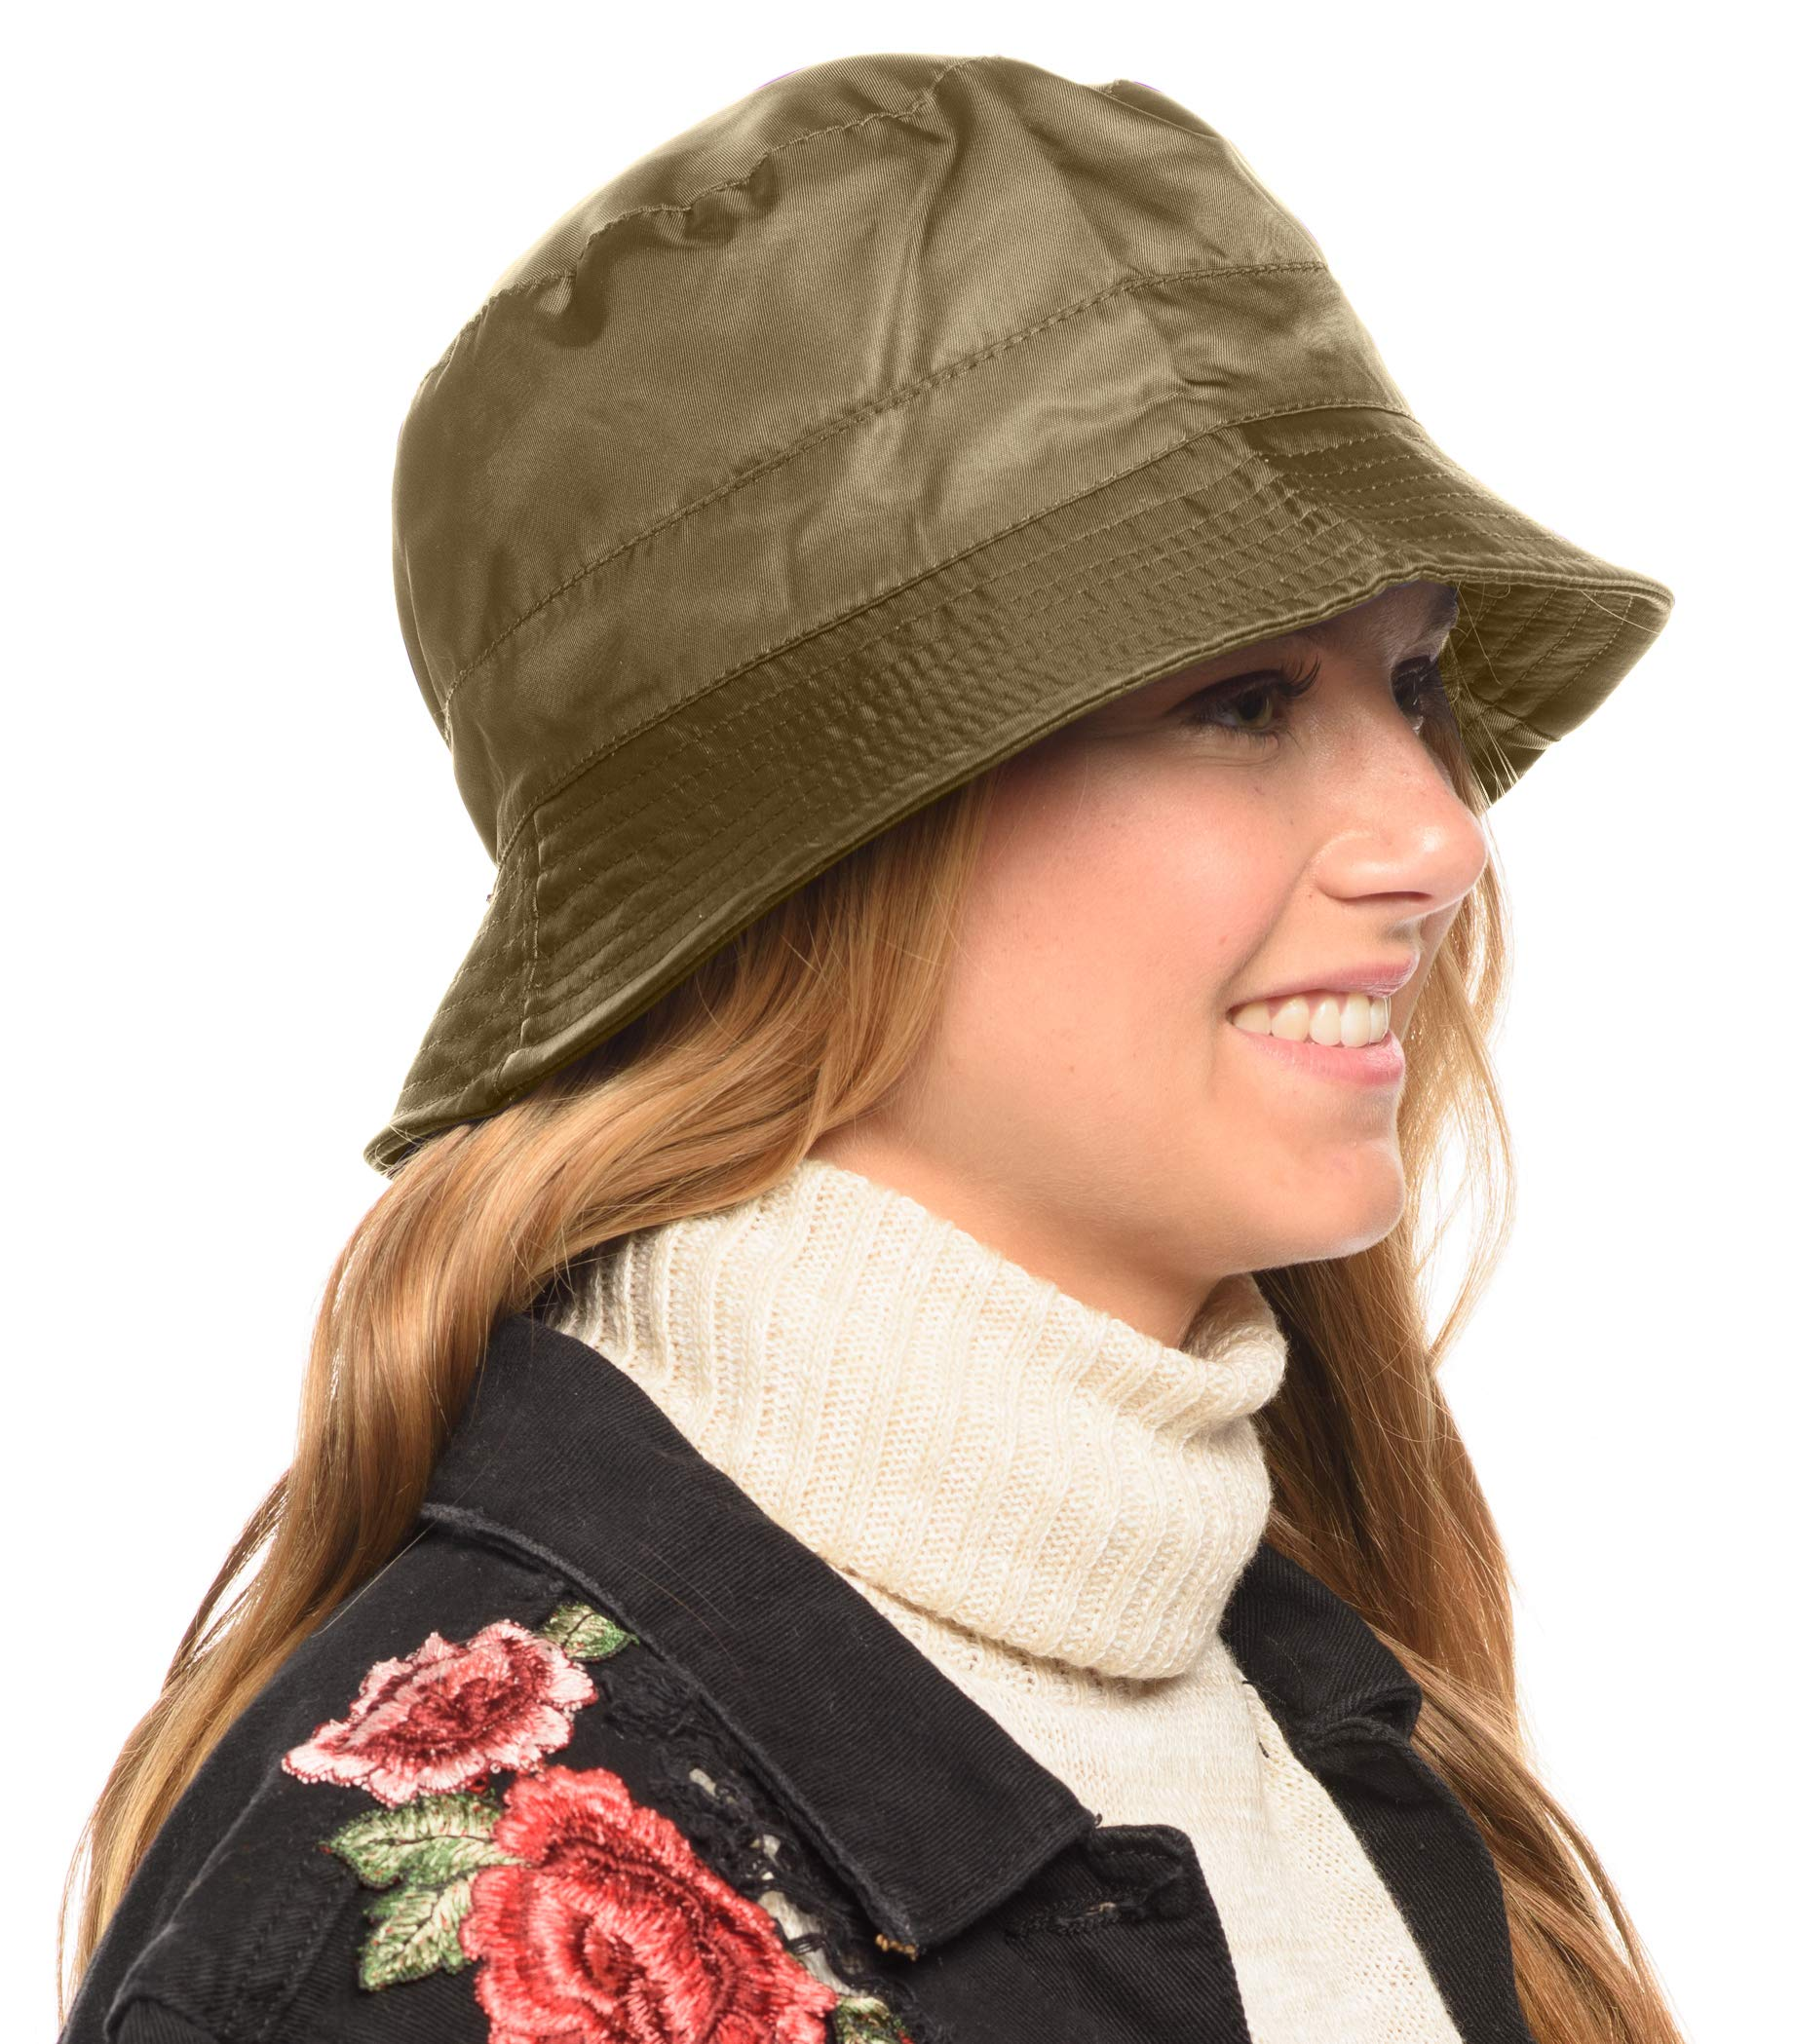 ANGELA & WILLIAM Adjustable Waterproof Bucket Rain Hat in Nylon, Easy to fold (Olive)